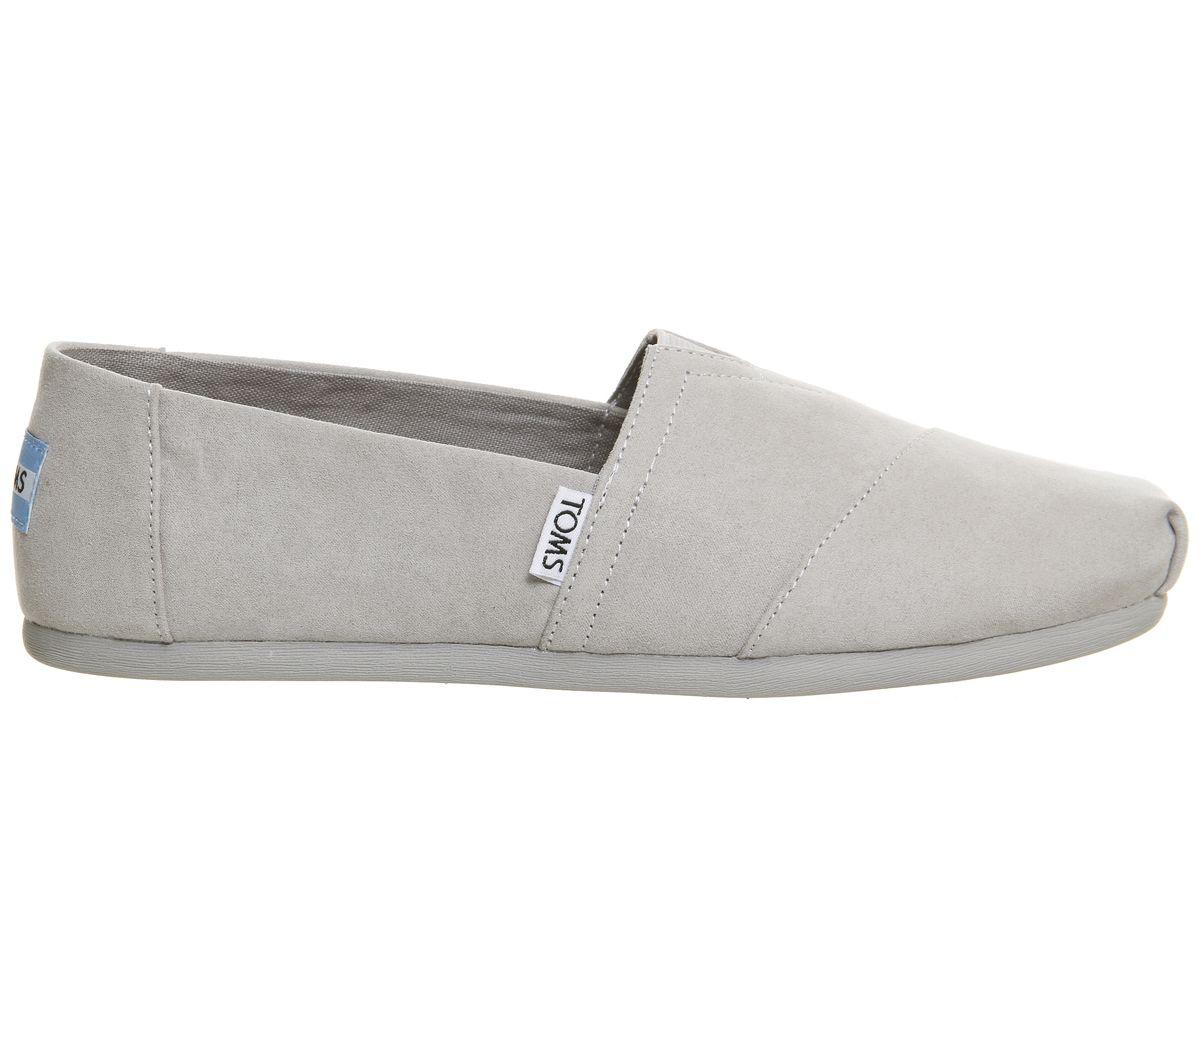 Womens-Toms-Seasonal-Classic-Slip-On-Drizzle-Grey-Flats thumbnail 5